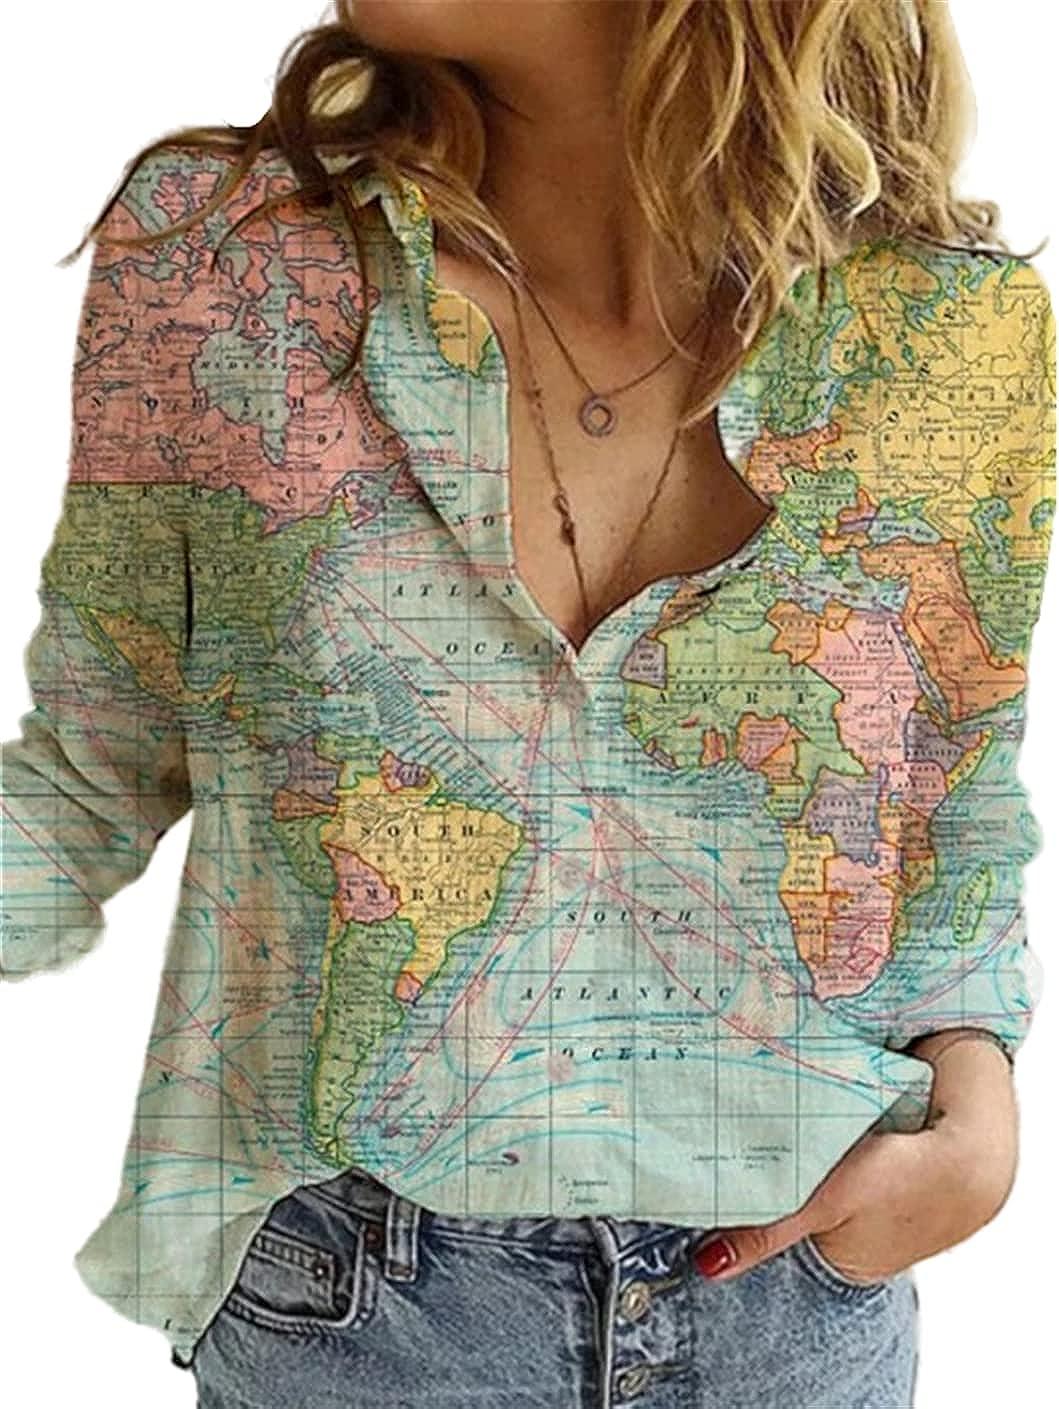 FRMUIC Women's Lapel Button Shirt World Map Print Long Sleeve Loose Casual Top